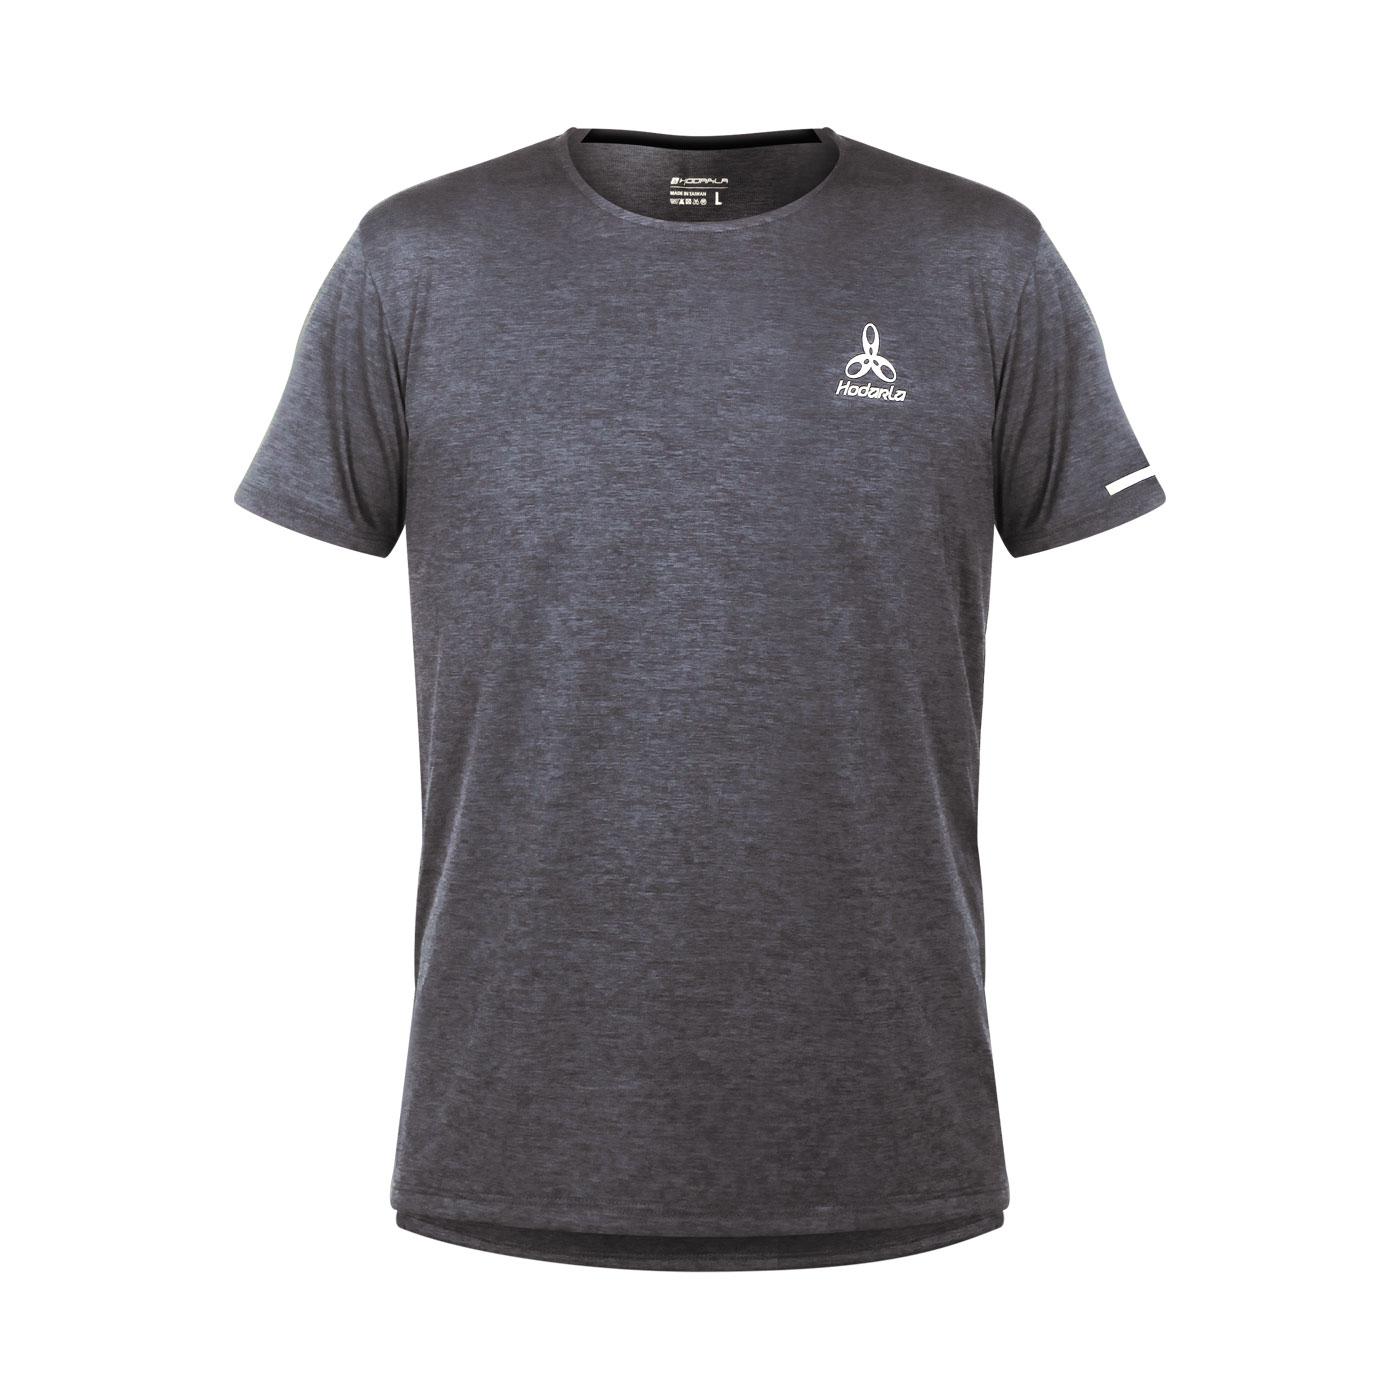 HODARLA 辰光剪接短袖T恤 3161501 - 麻花灰